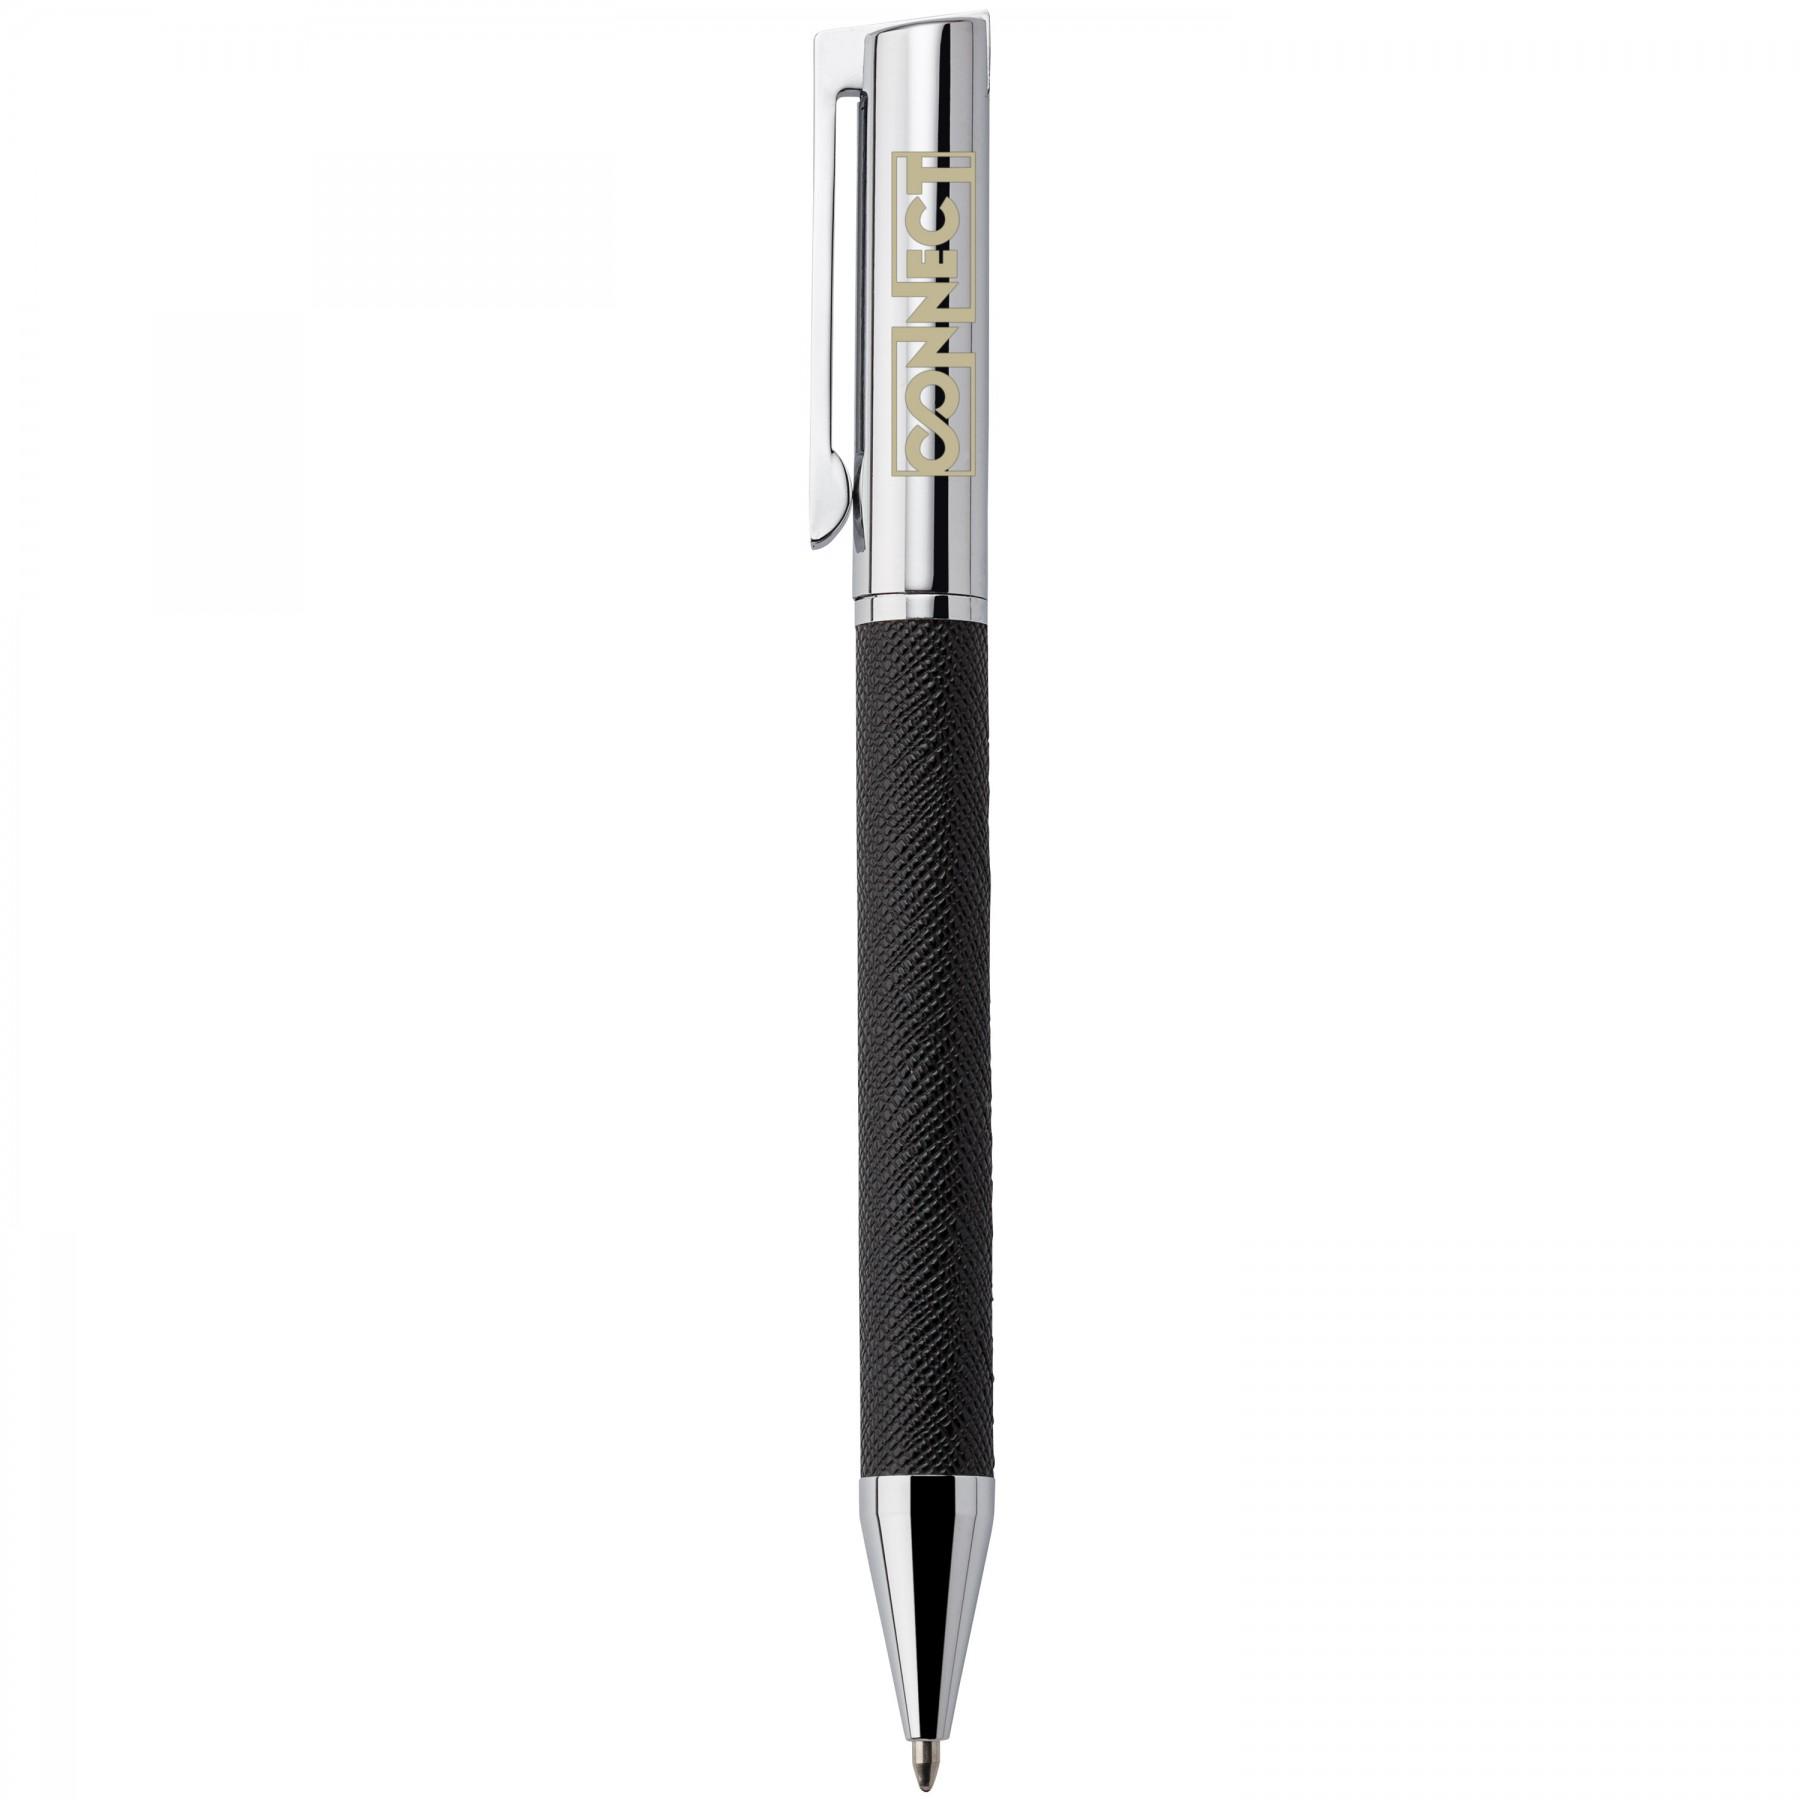 Toscano Ballpoint Pen, G3151, Laser Engraved